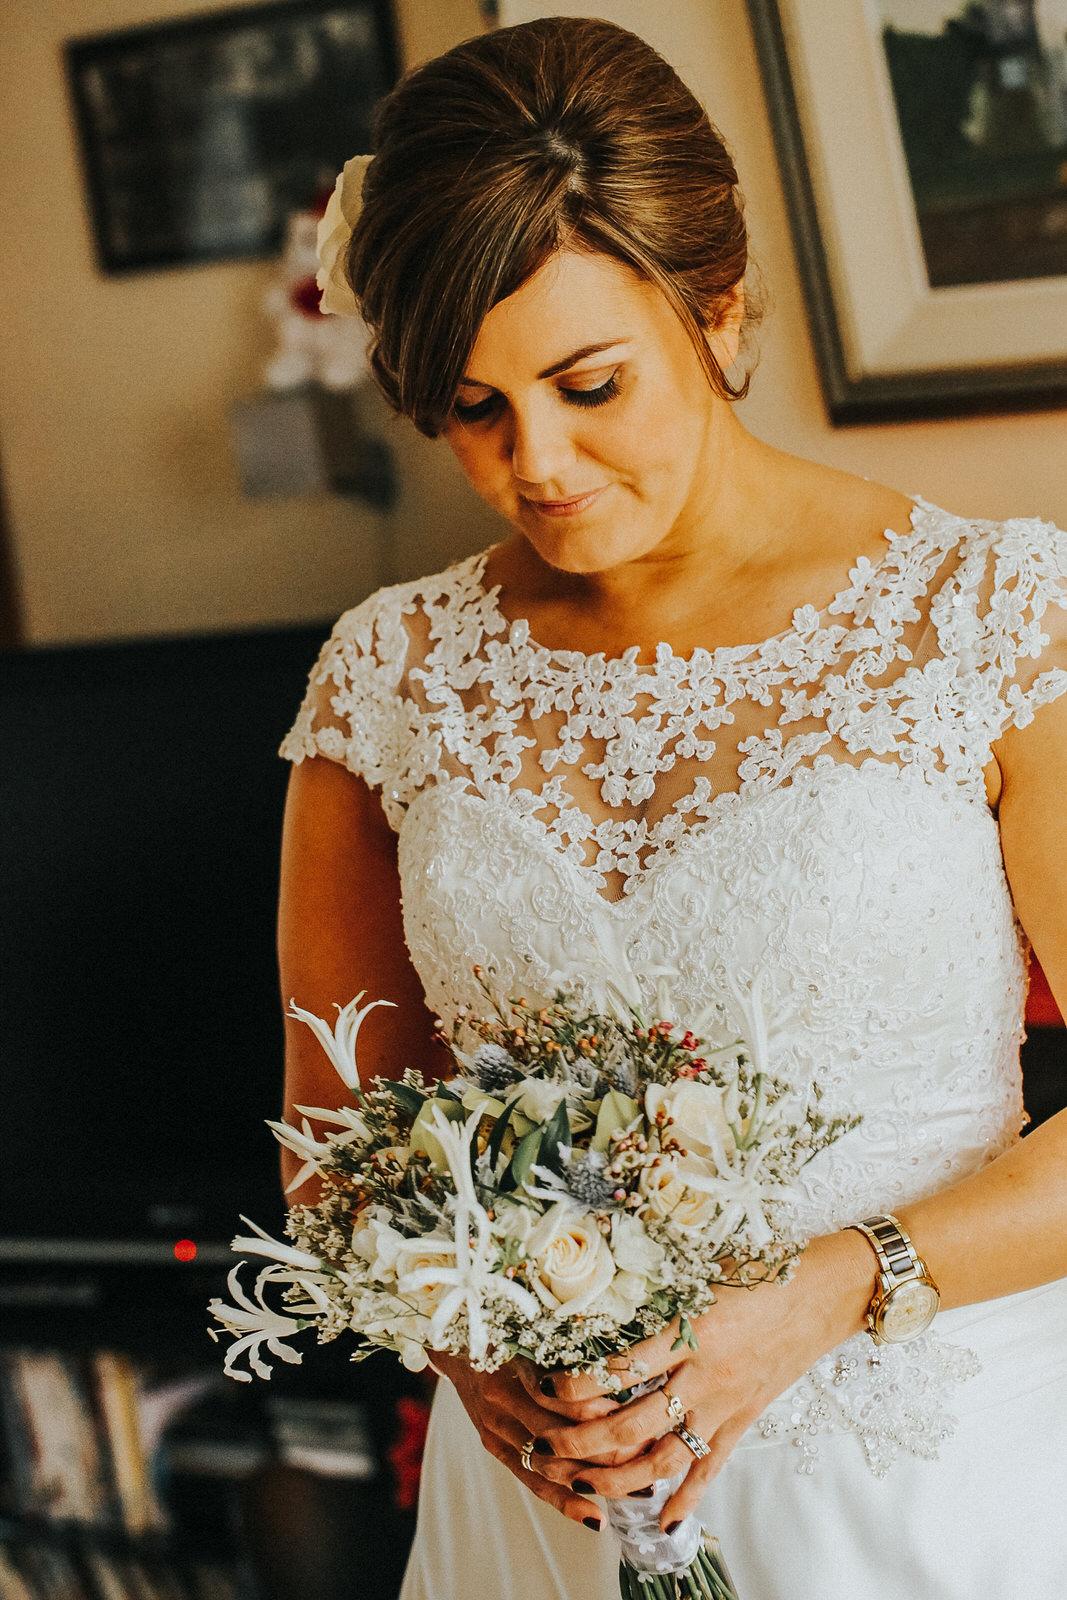 Roger_Kenny_wedding_photographer_Tankardstown_567.jpg